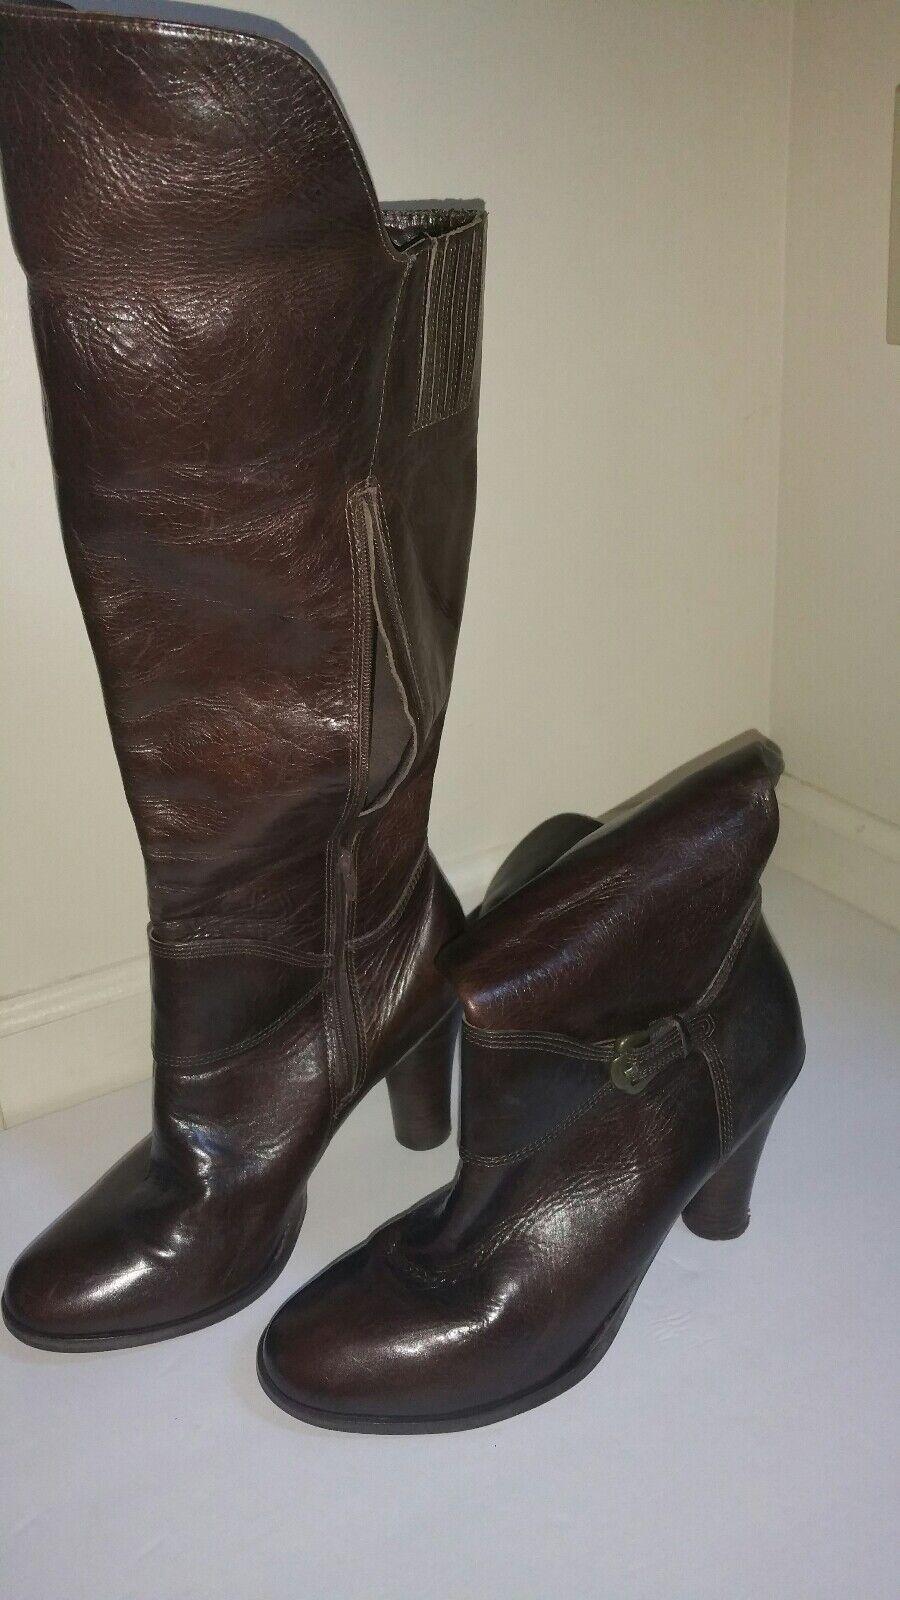 Matisse Women Genuine Leather Round Toe Mid-Calf Knee High Boots Dark Brown 9.5